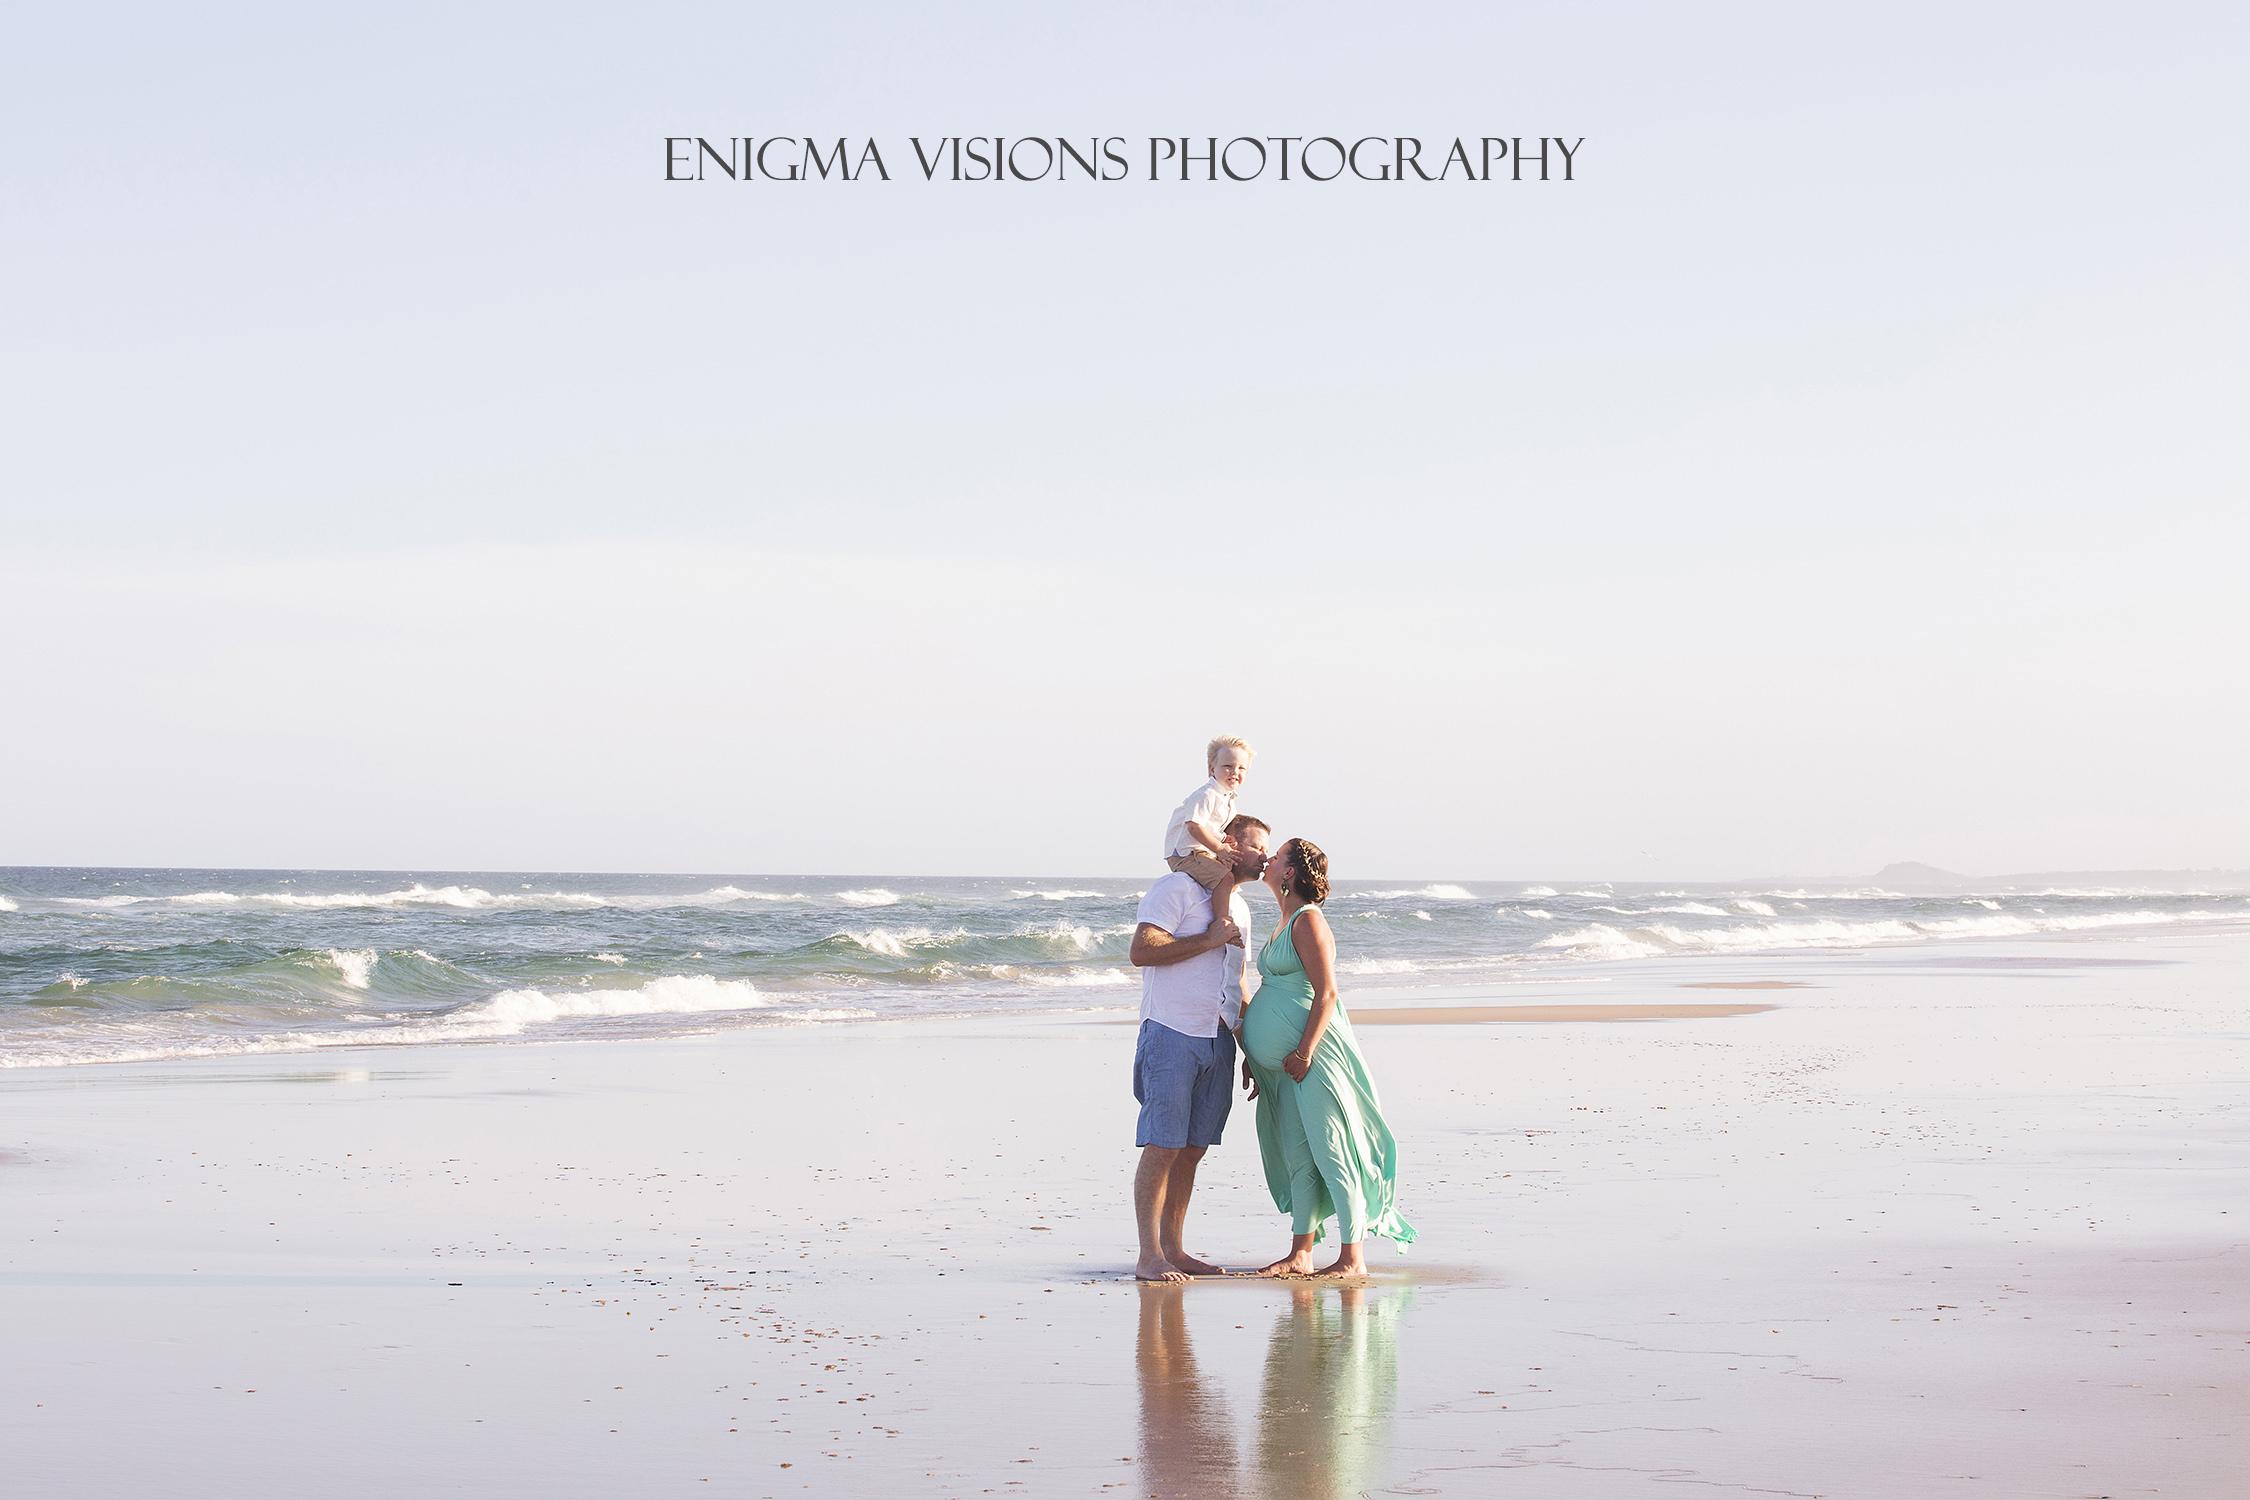 enigma_visions_photography_maternity_tara (12).jpg